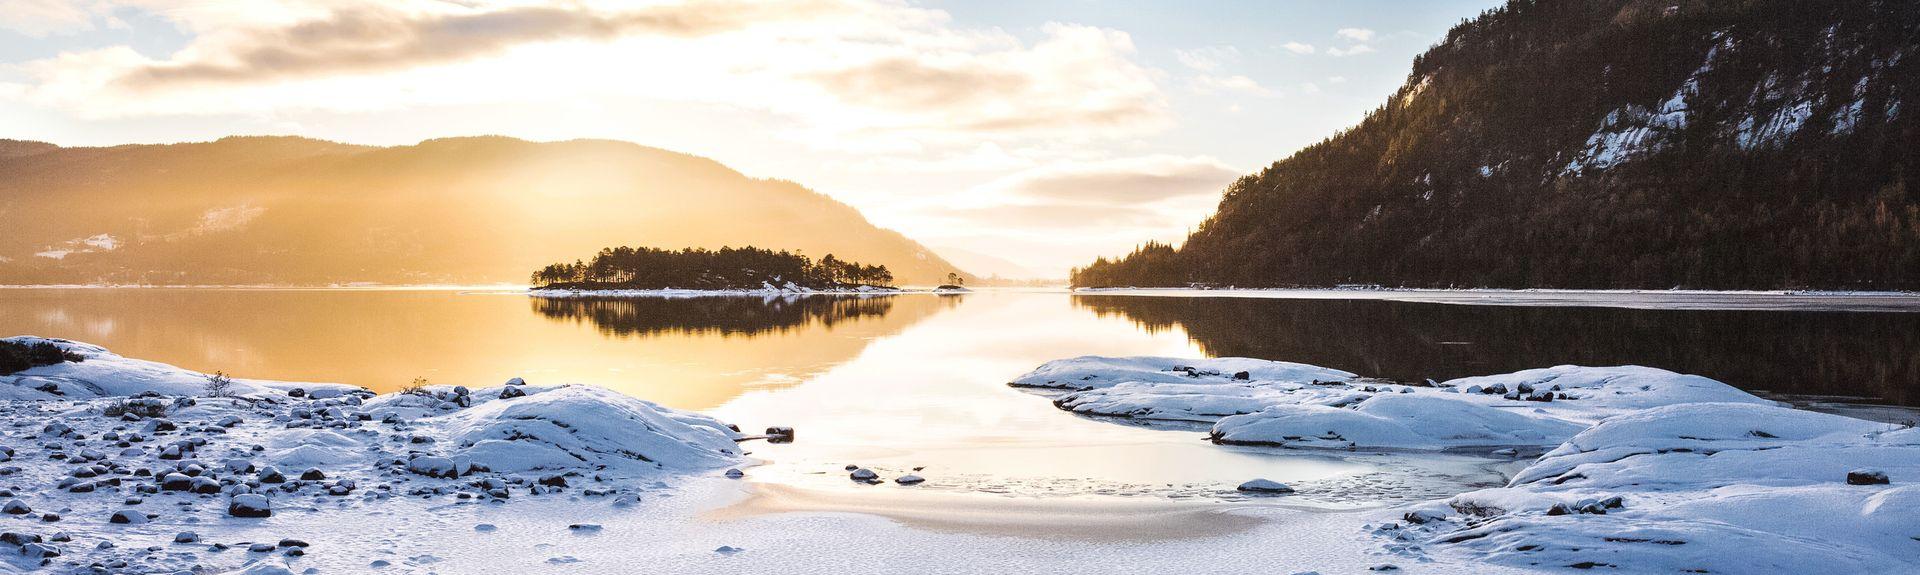 Åseral, Vest-Agder, Norway